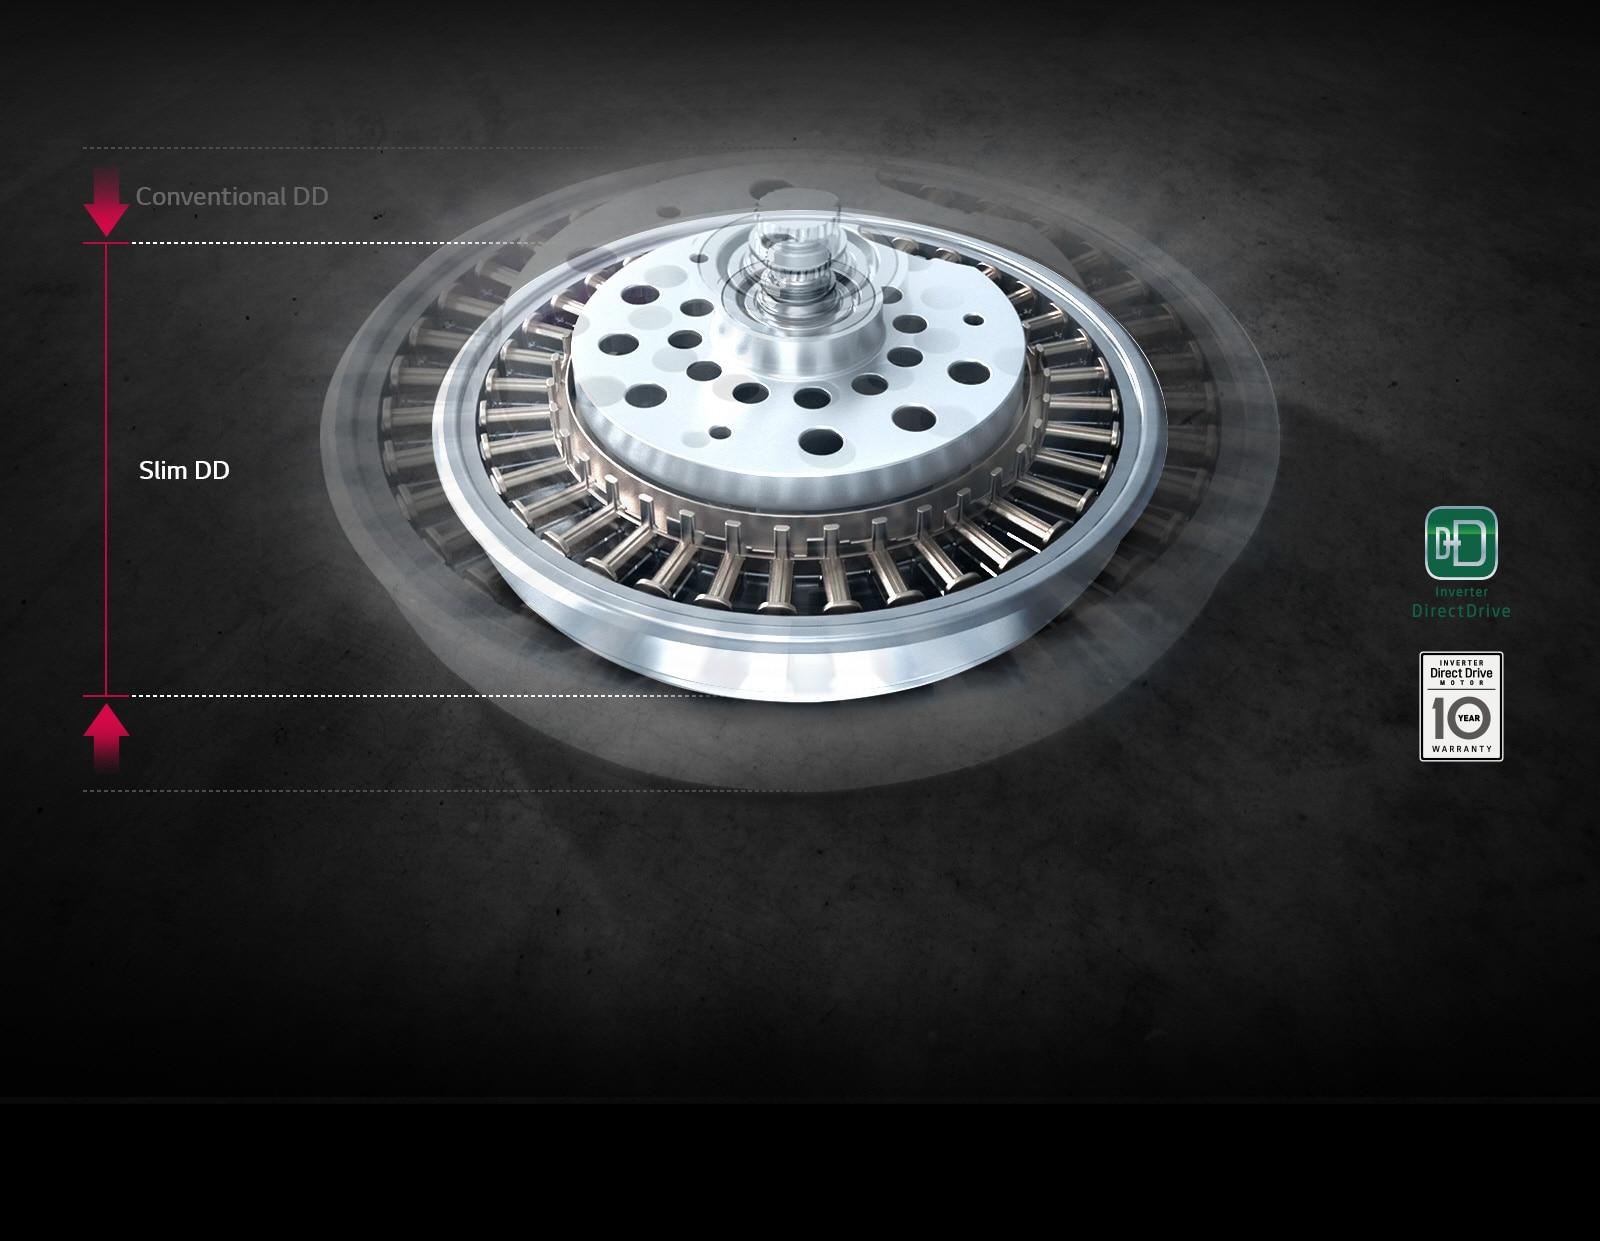 Precise Control & Reliable Durability1